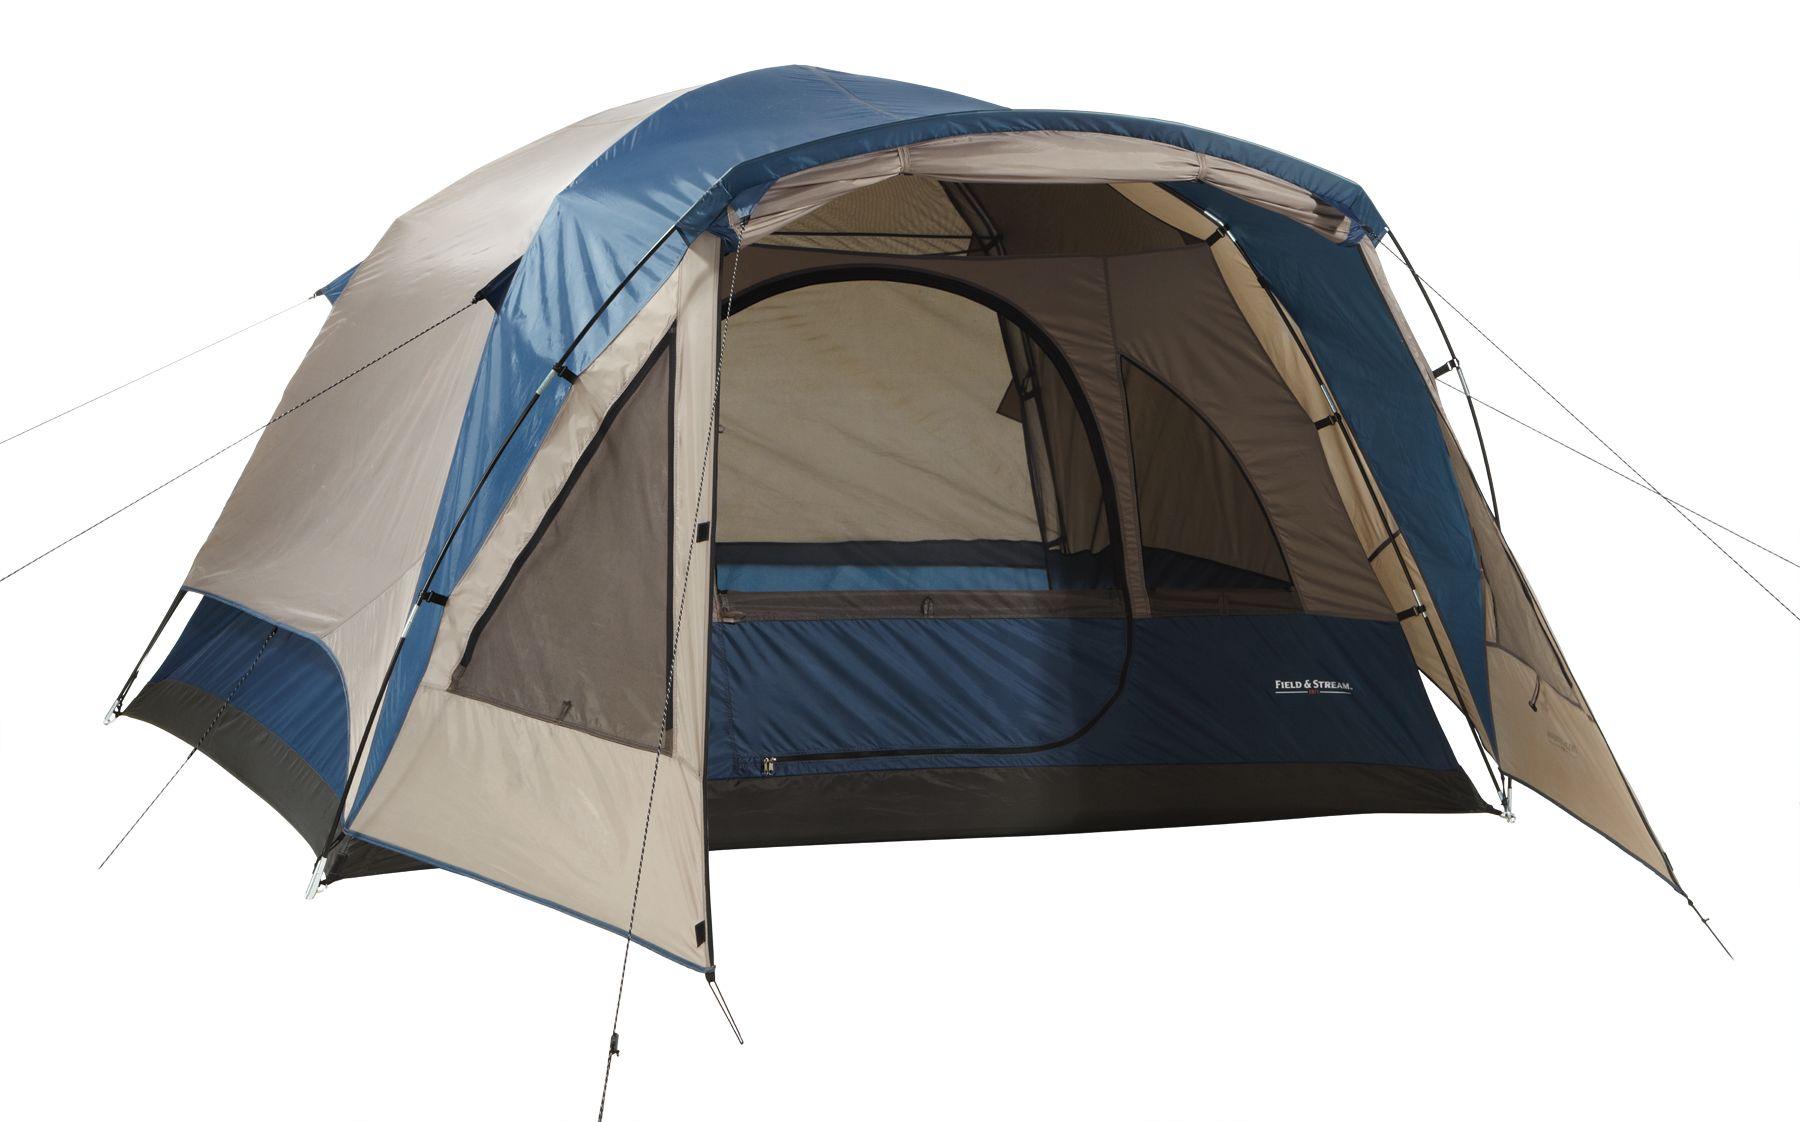 Field u0026 Stream Wilderness Lodge 4 Person Dome Tent  sc 1 st  Field u0026 Stream & Camping Tents - Dome Family u0026 Backyard | Field u0026 Stream